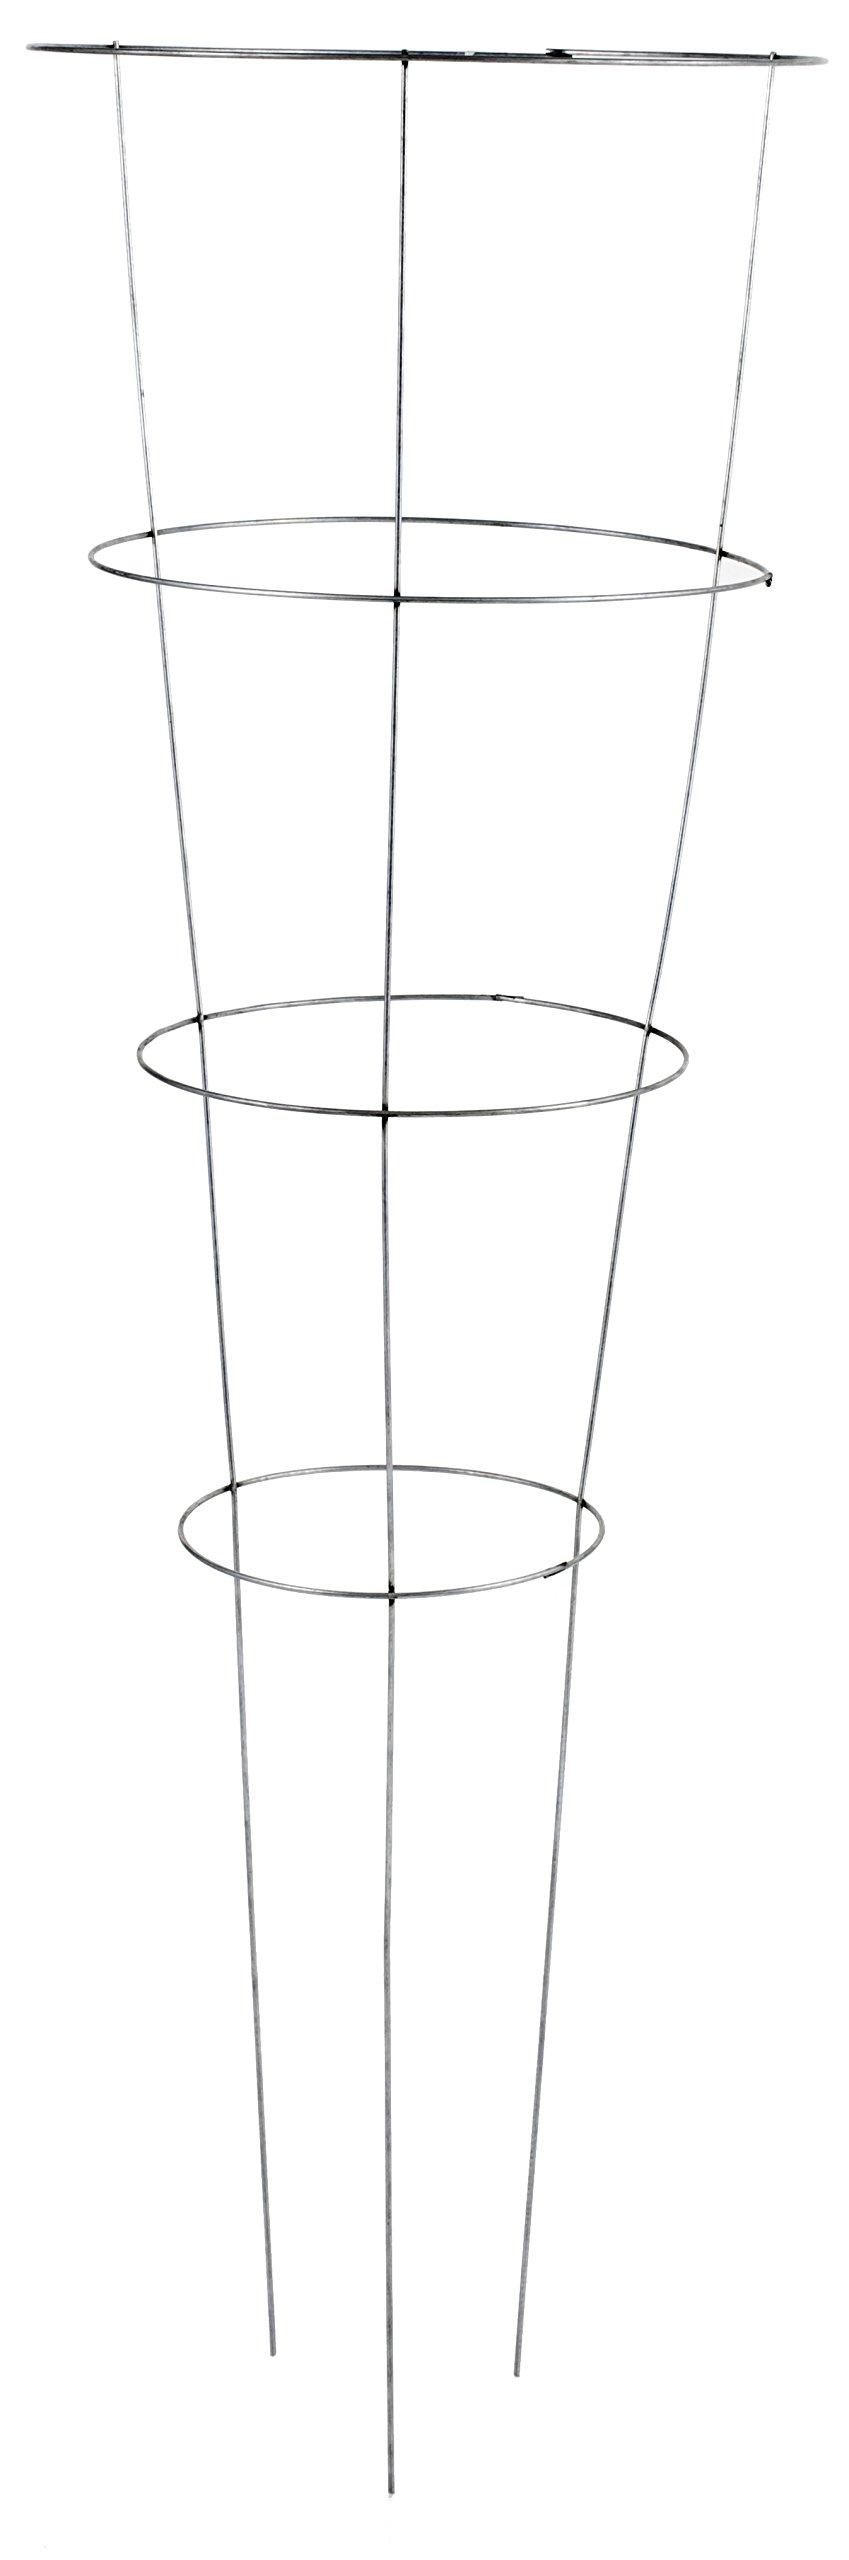 Economy Galvanized Tomato Cages (775 pallet) 42'' Silver